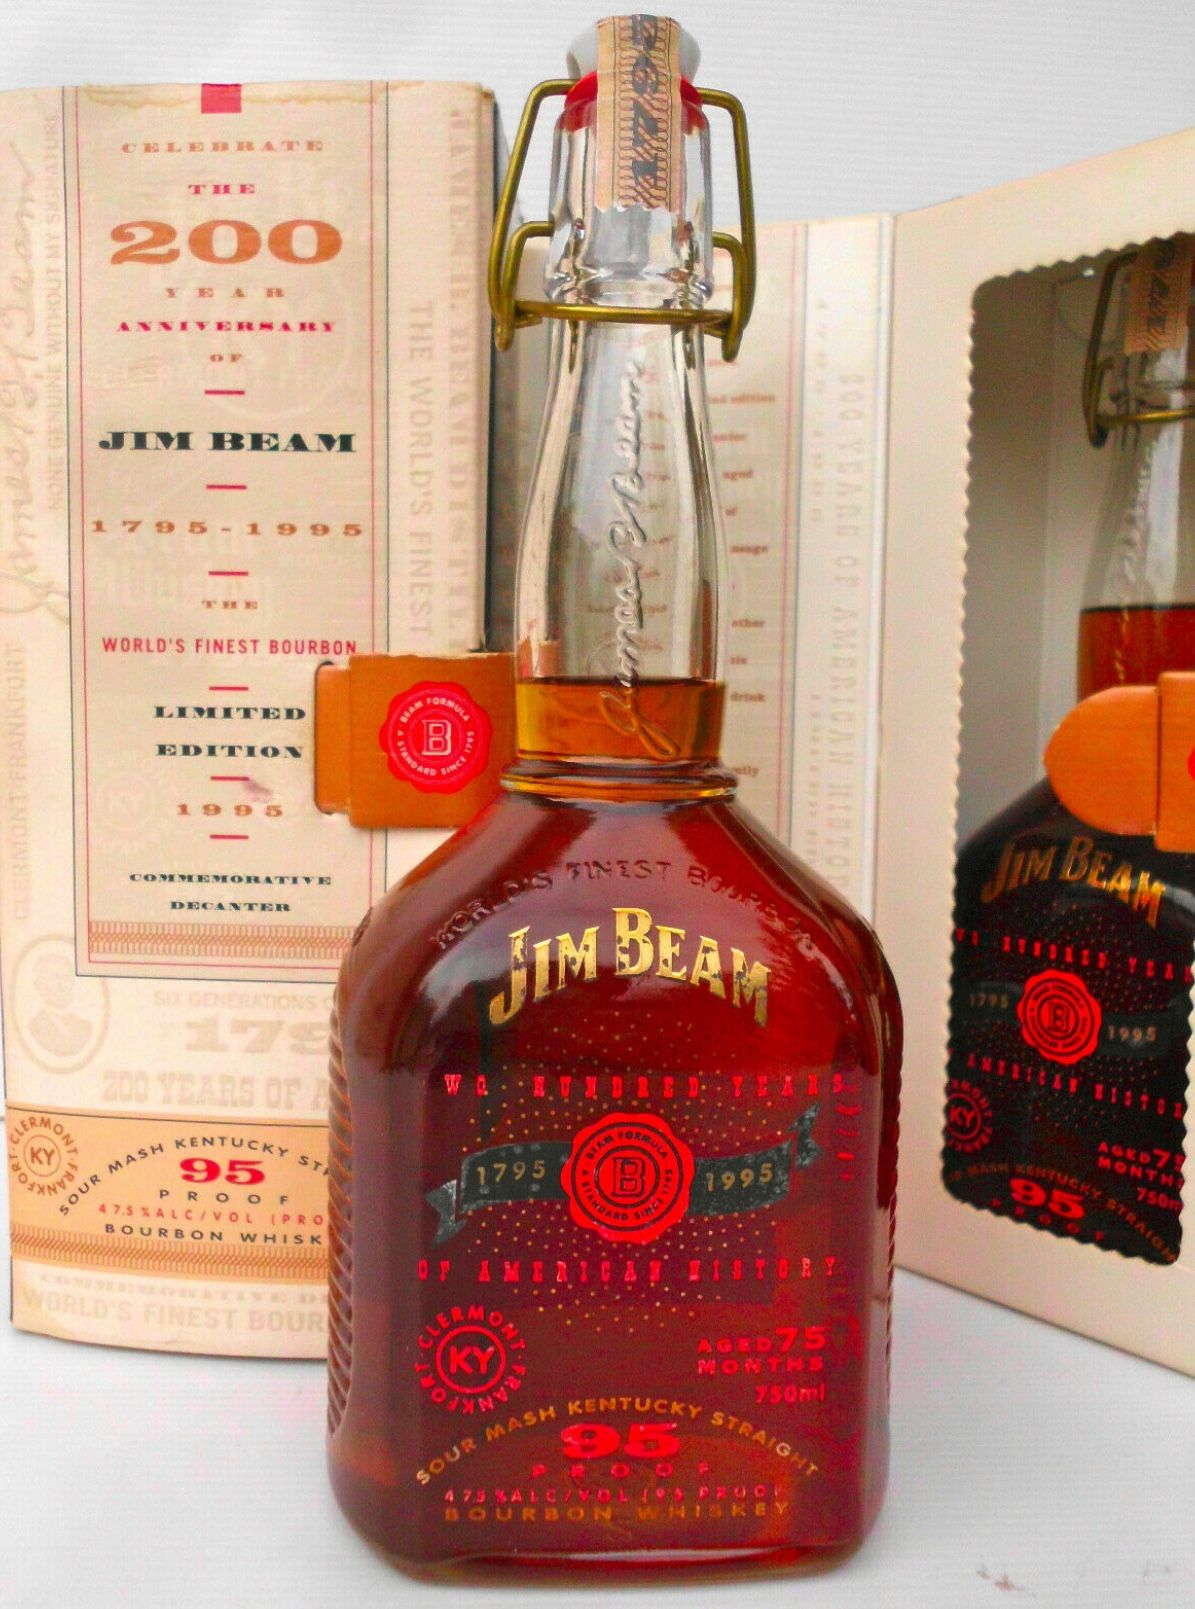 Jim Beam 200 Years Anniversary Bourbon Bottle Cigars And Whiskey Bourbon Whisky Bar